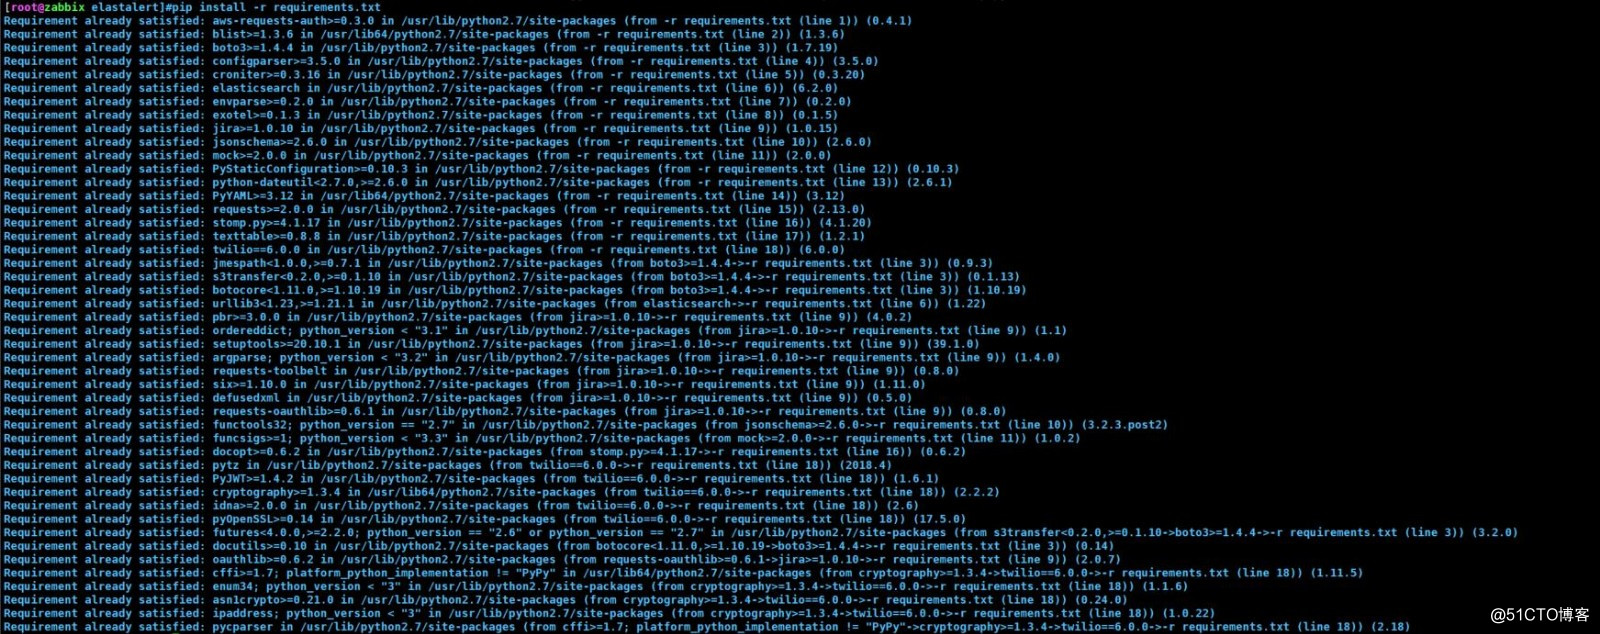 ELK借助ElastAlert实现故障提前感知预警功能